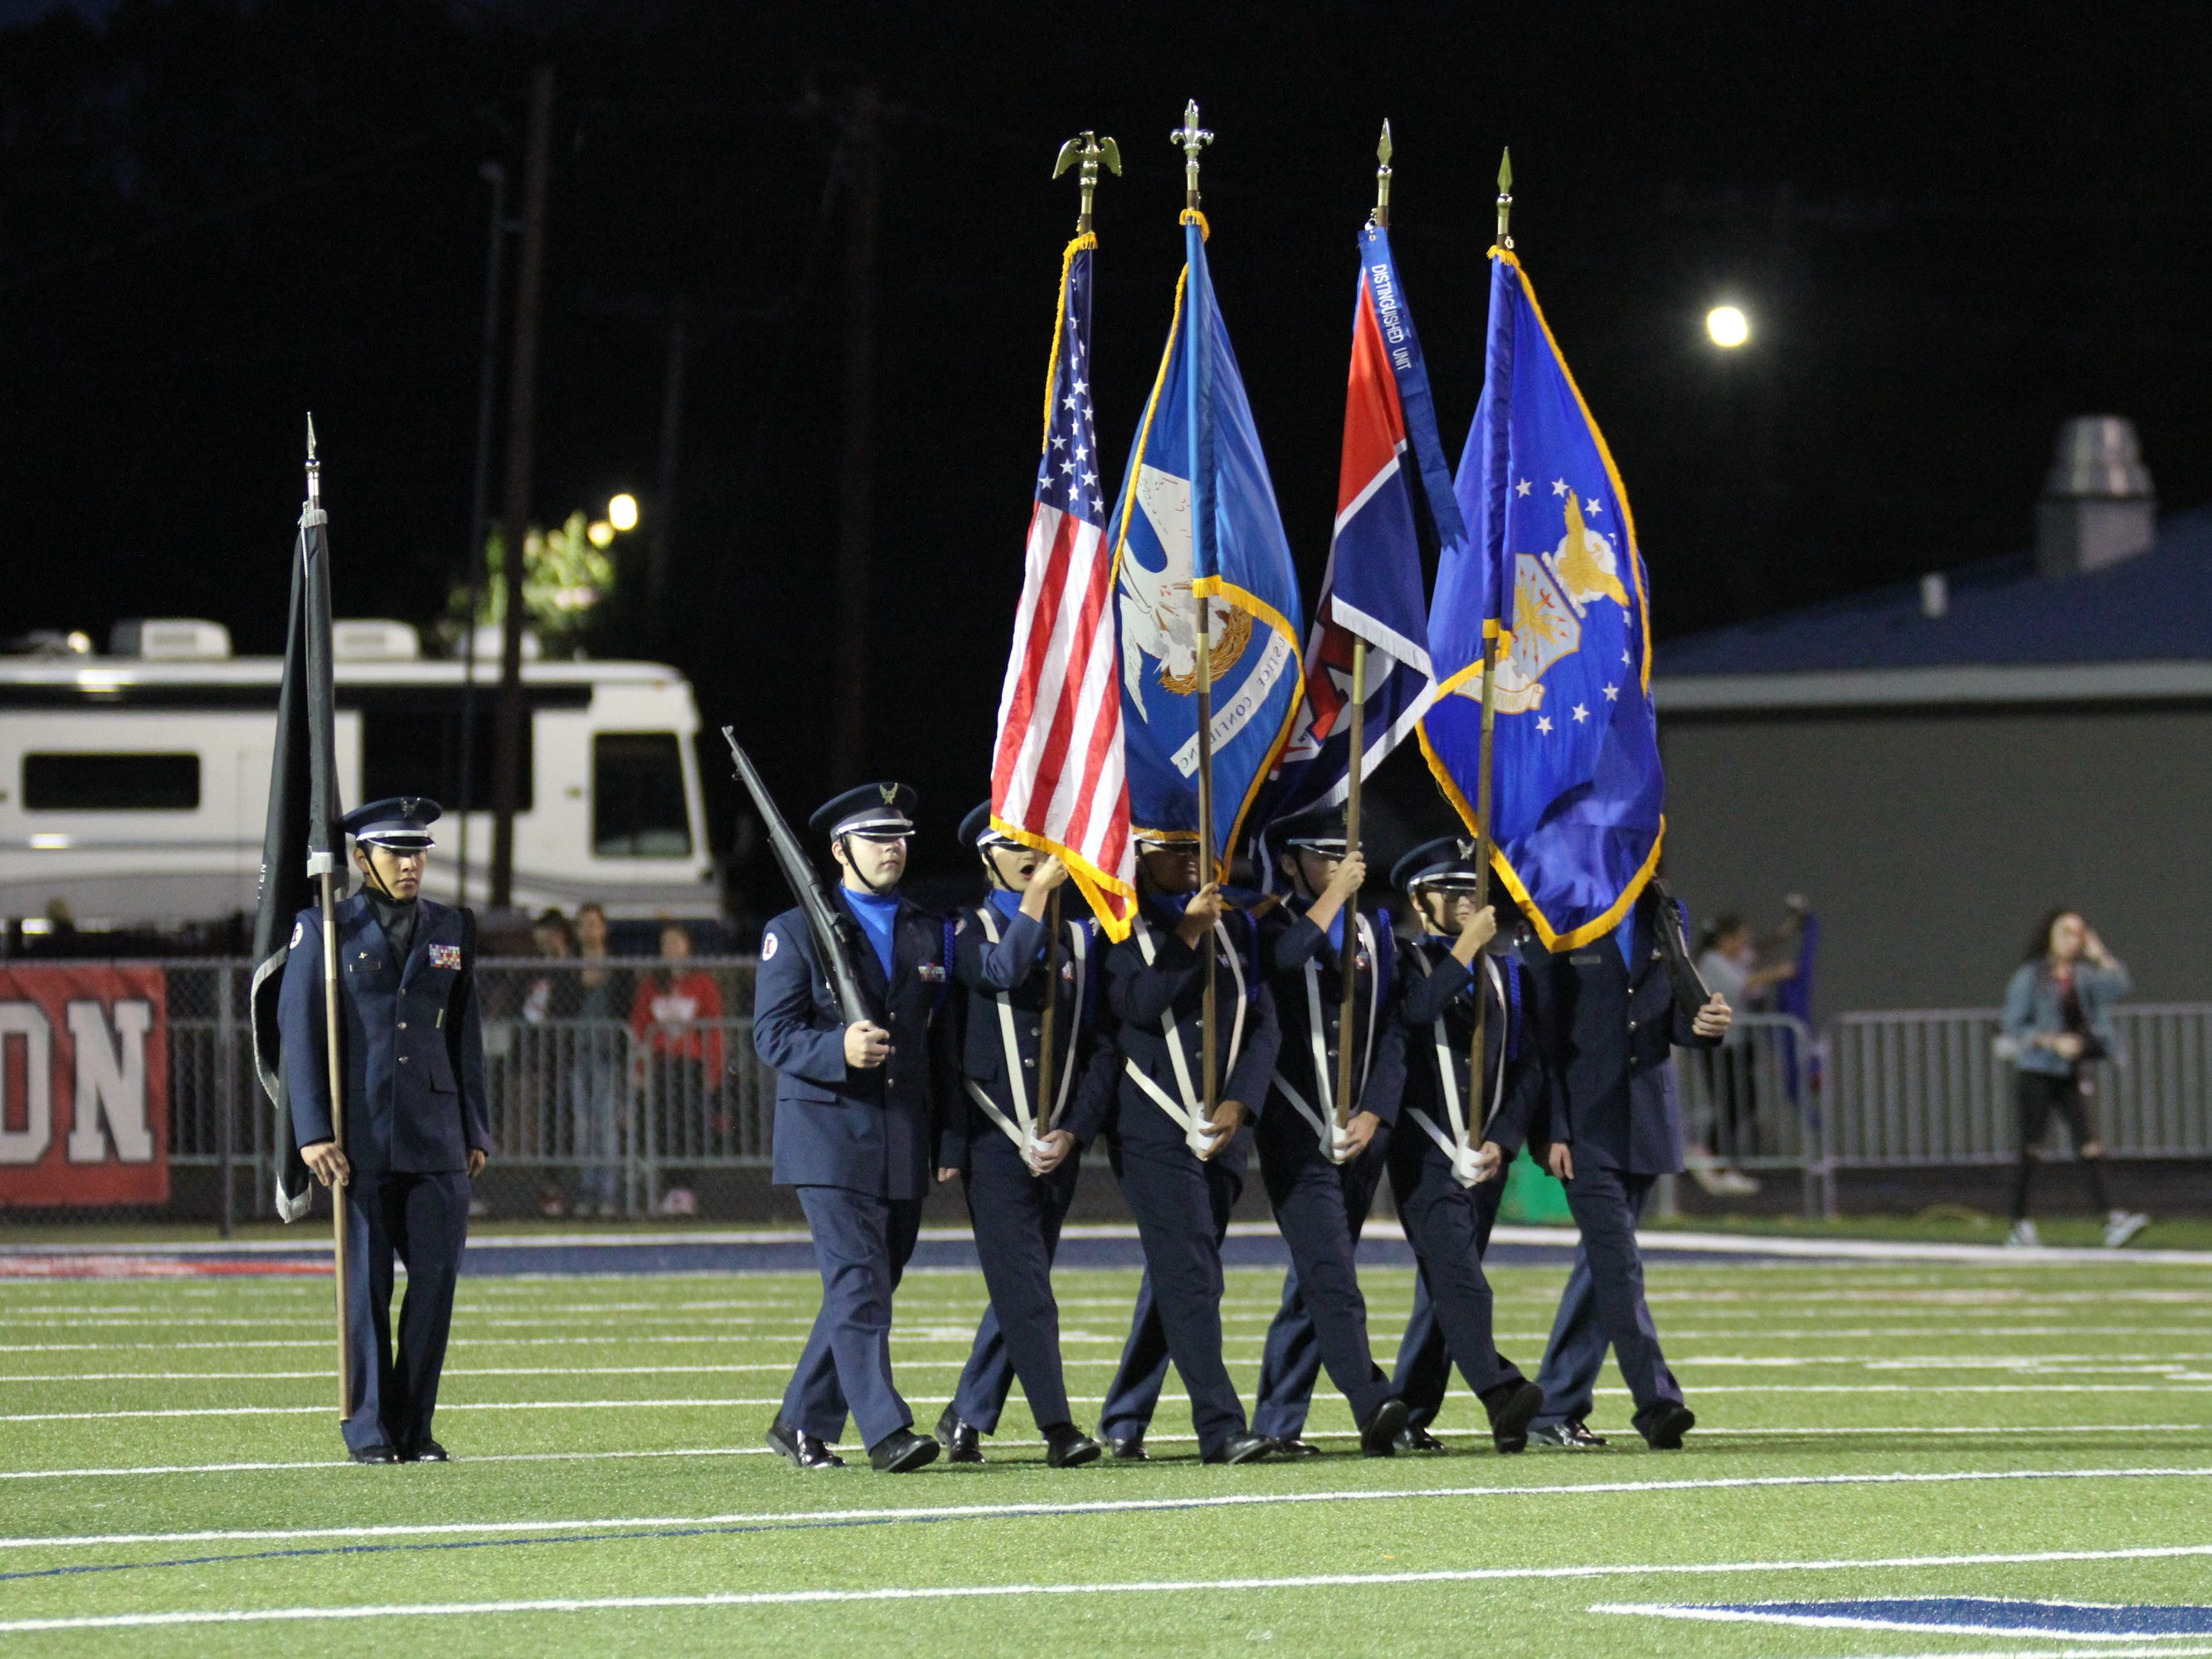 West Monroe defeats Alexandria 37-17 at West Monroe High School in West Monroe, La. on Oct. 12